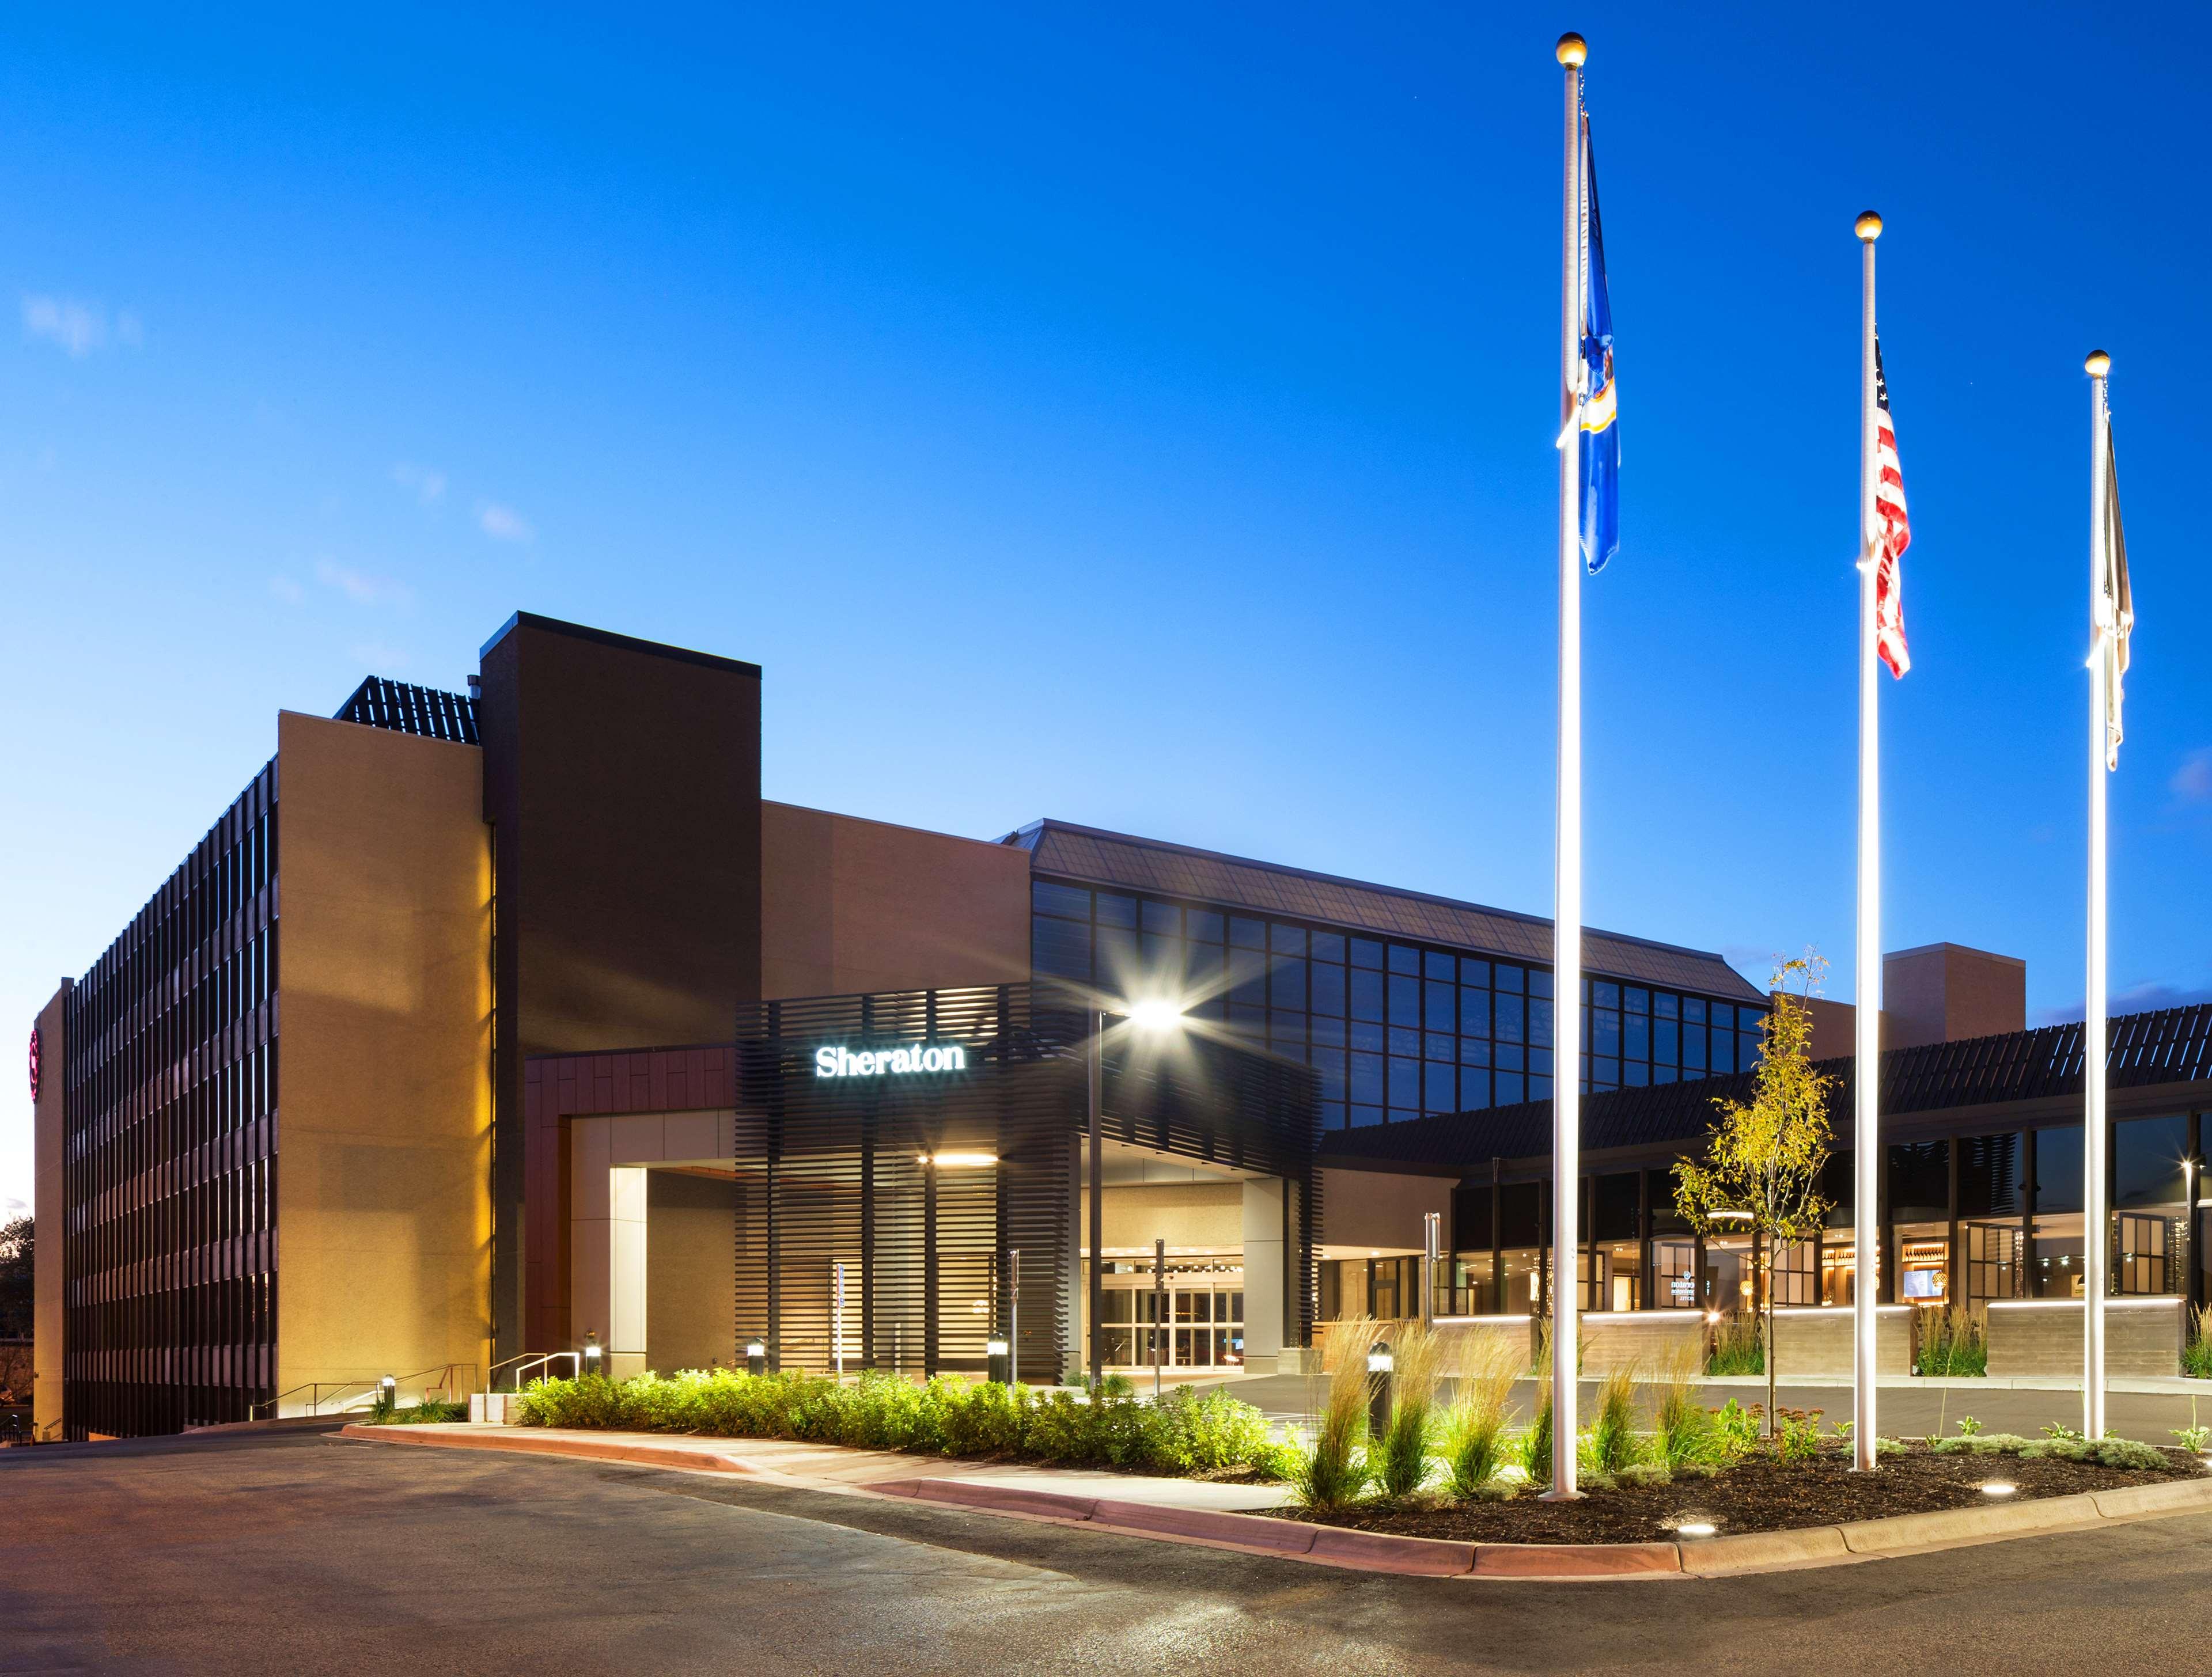 Sheraton Bloomington Hotel image 0